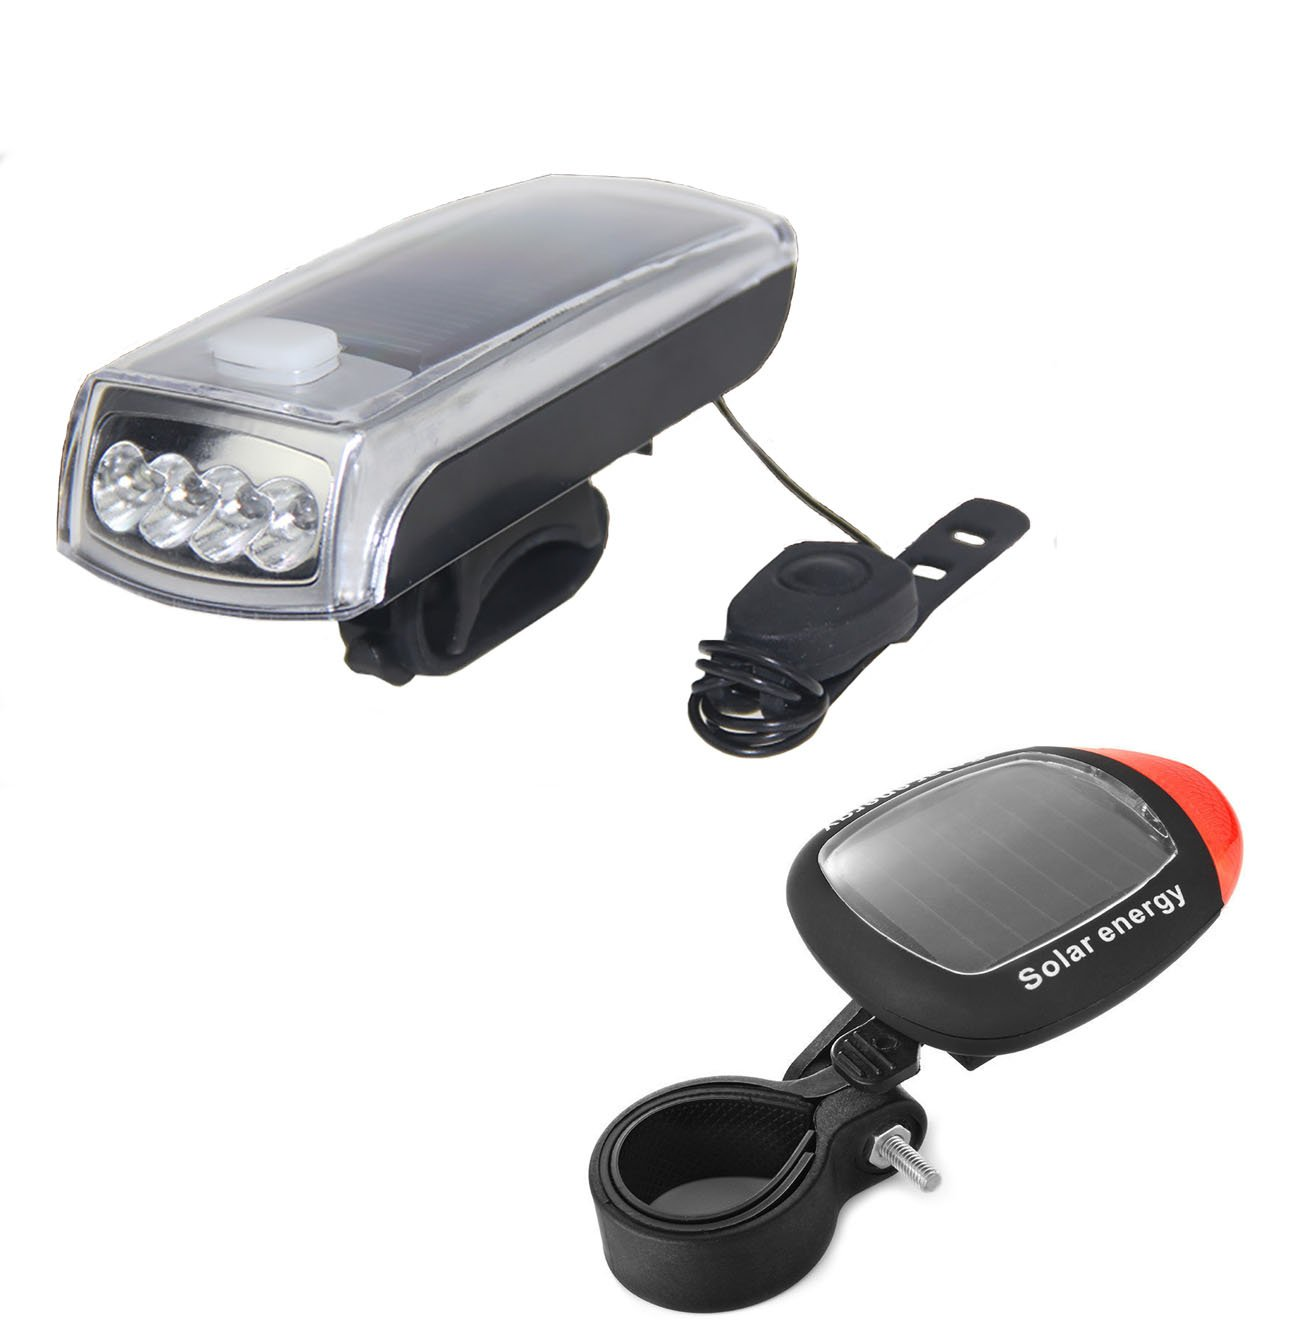 Bicycle Bike LED Bike Light Lights Front Waterproof Lamp Torch Hol JF